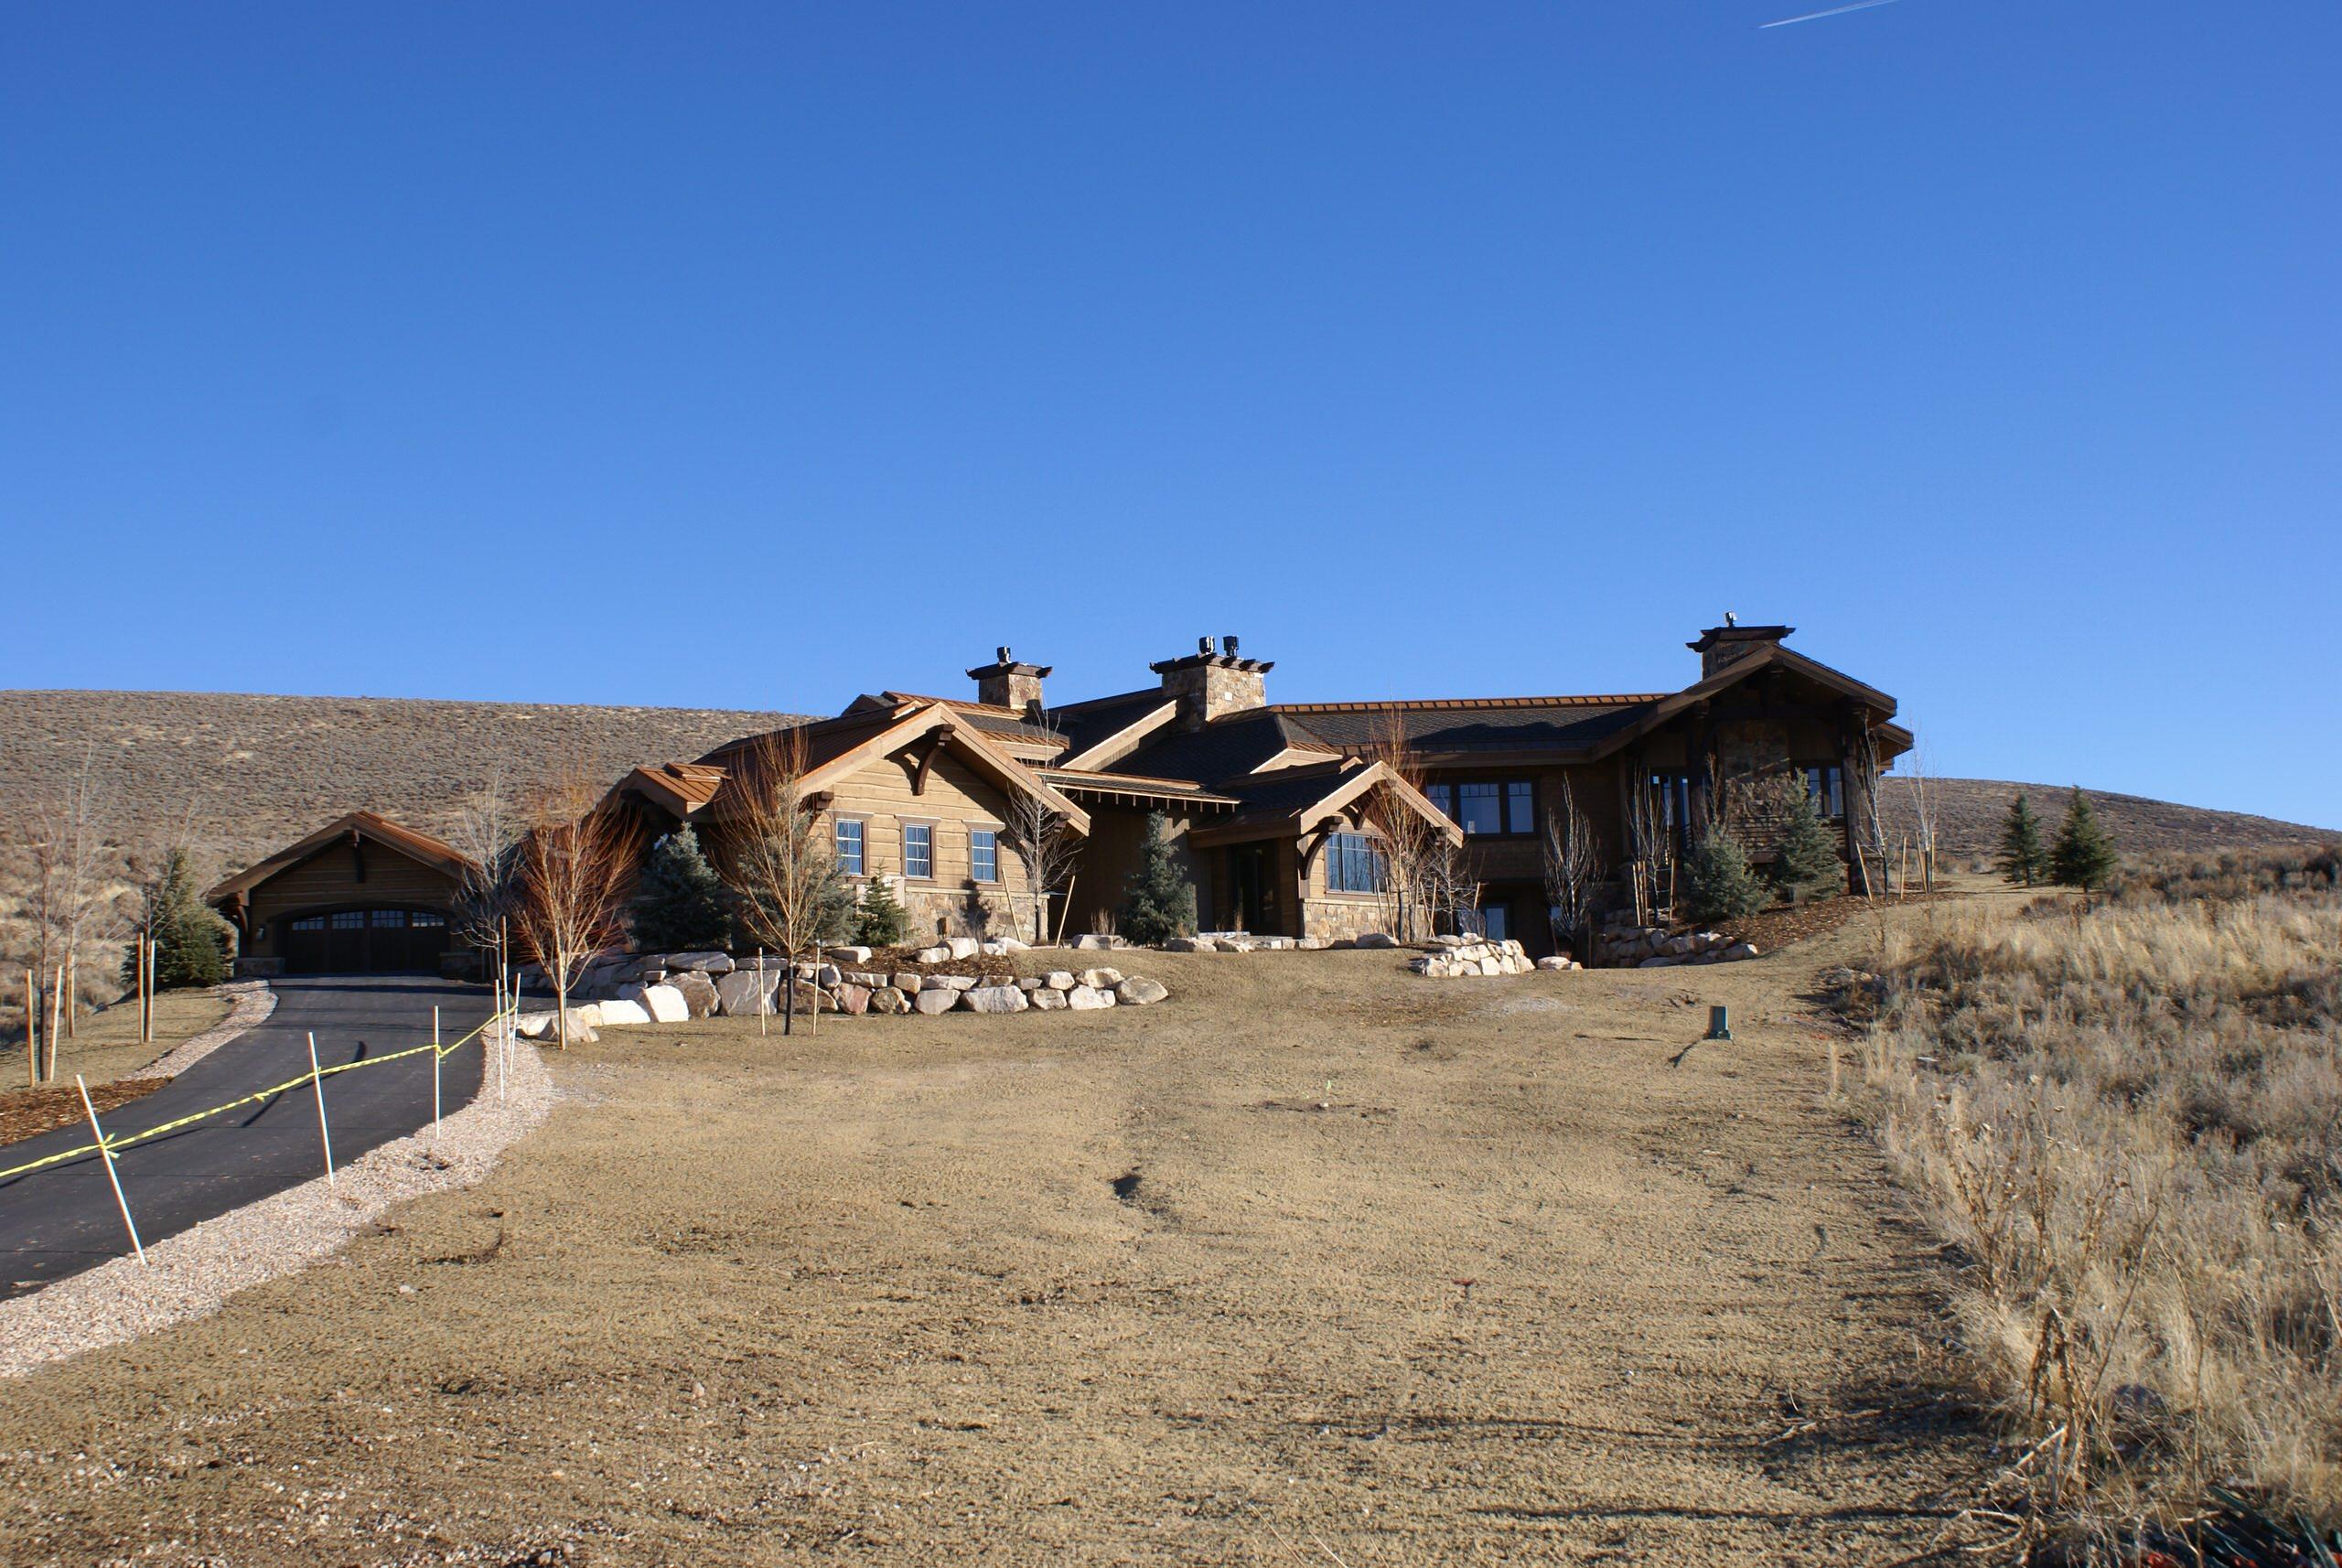 Promontory I, Park City, Utah, 2008